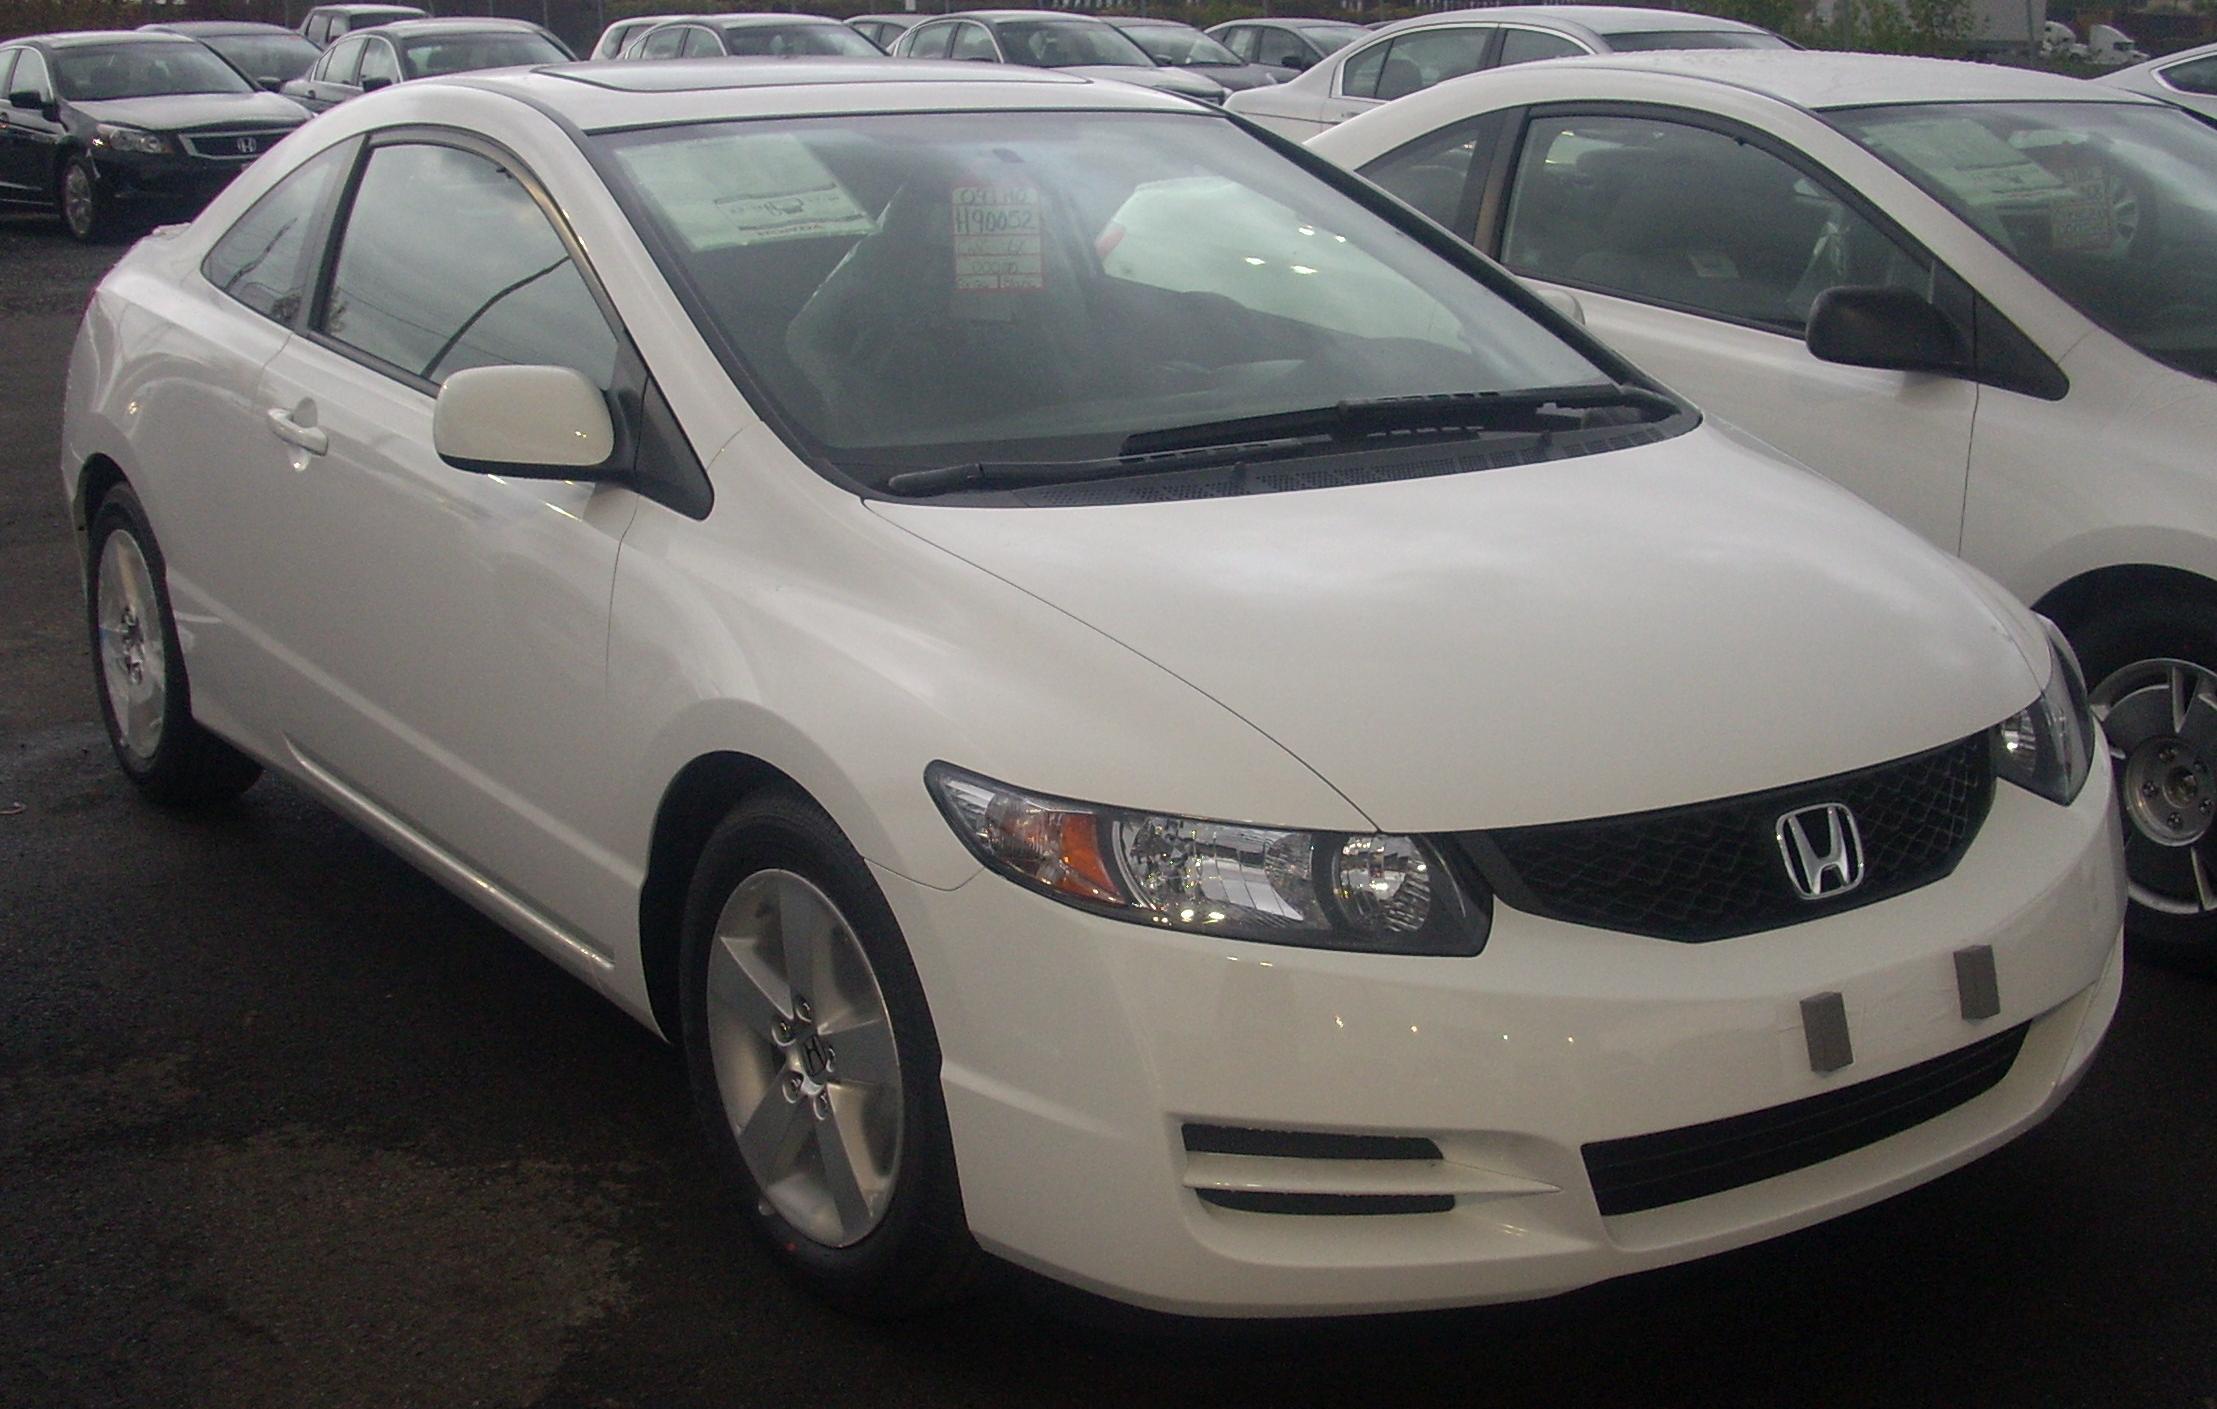 File:'09 Honda Civic Coupe.JPG - Wikimedia Commons